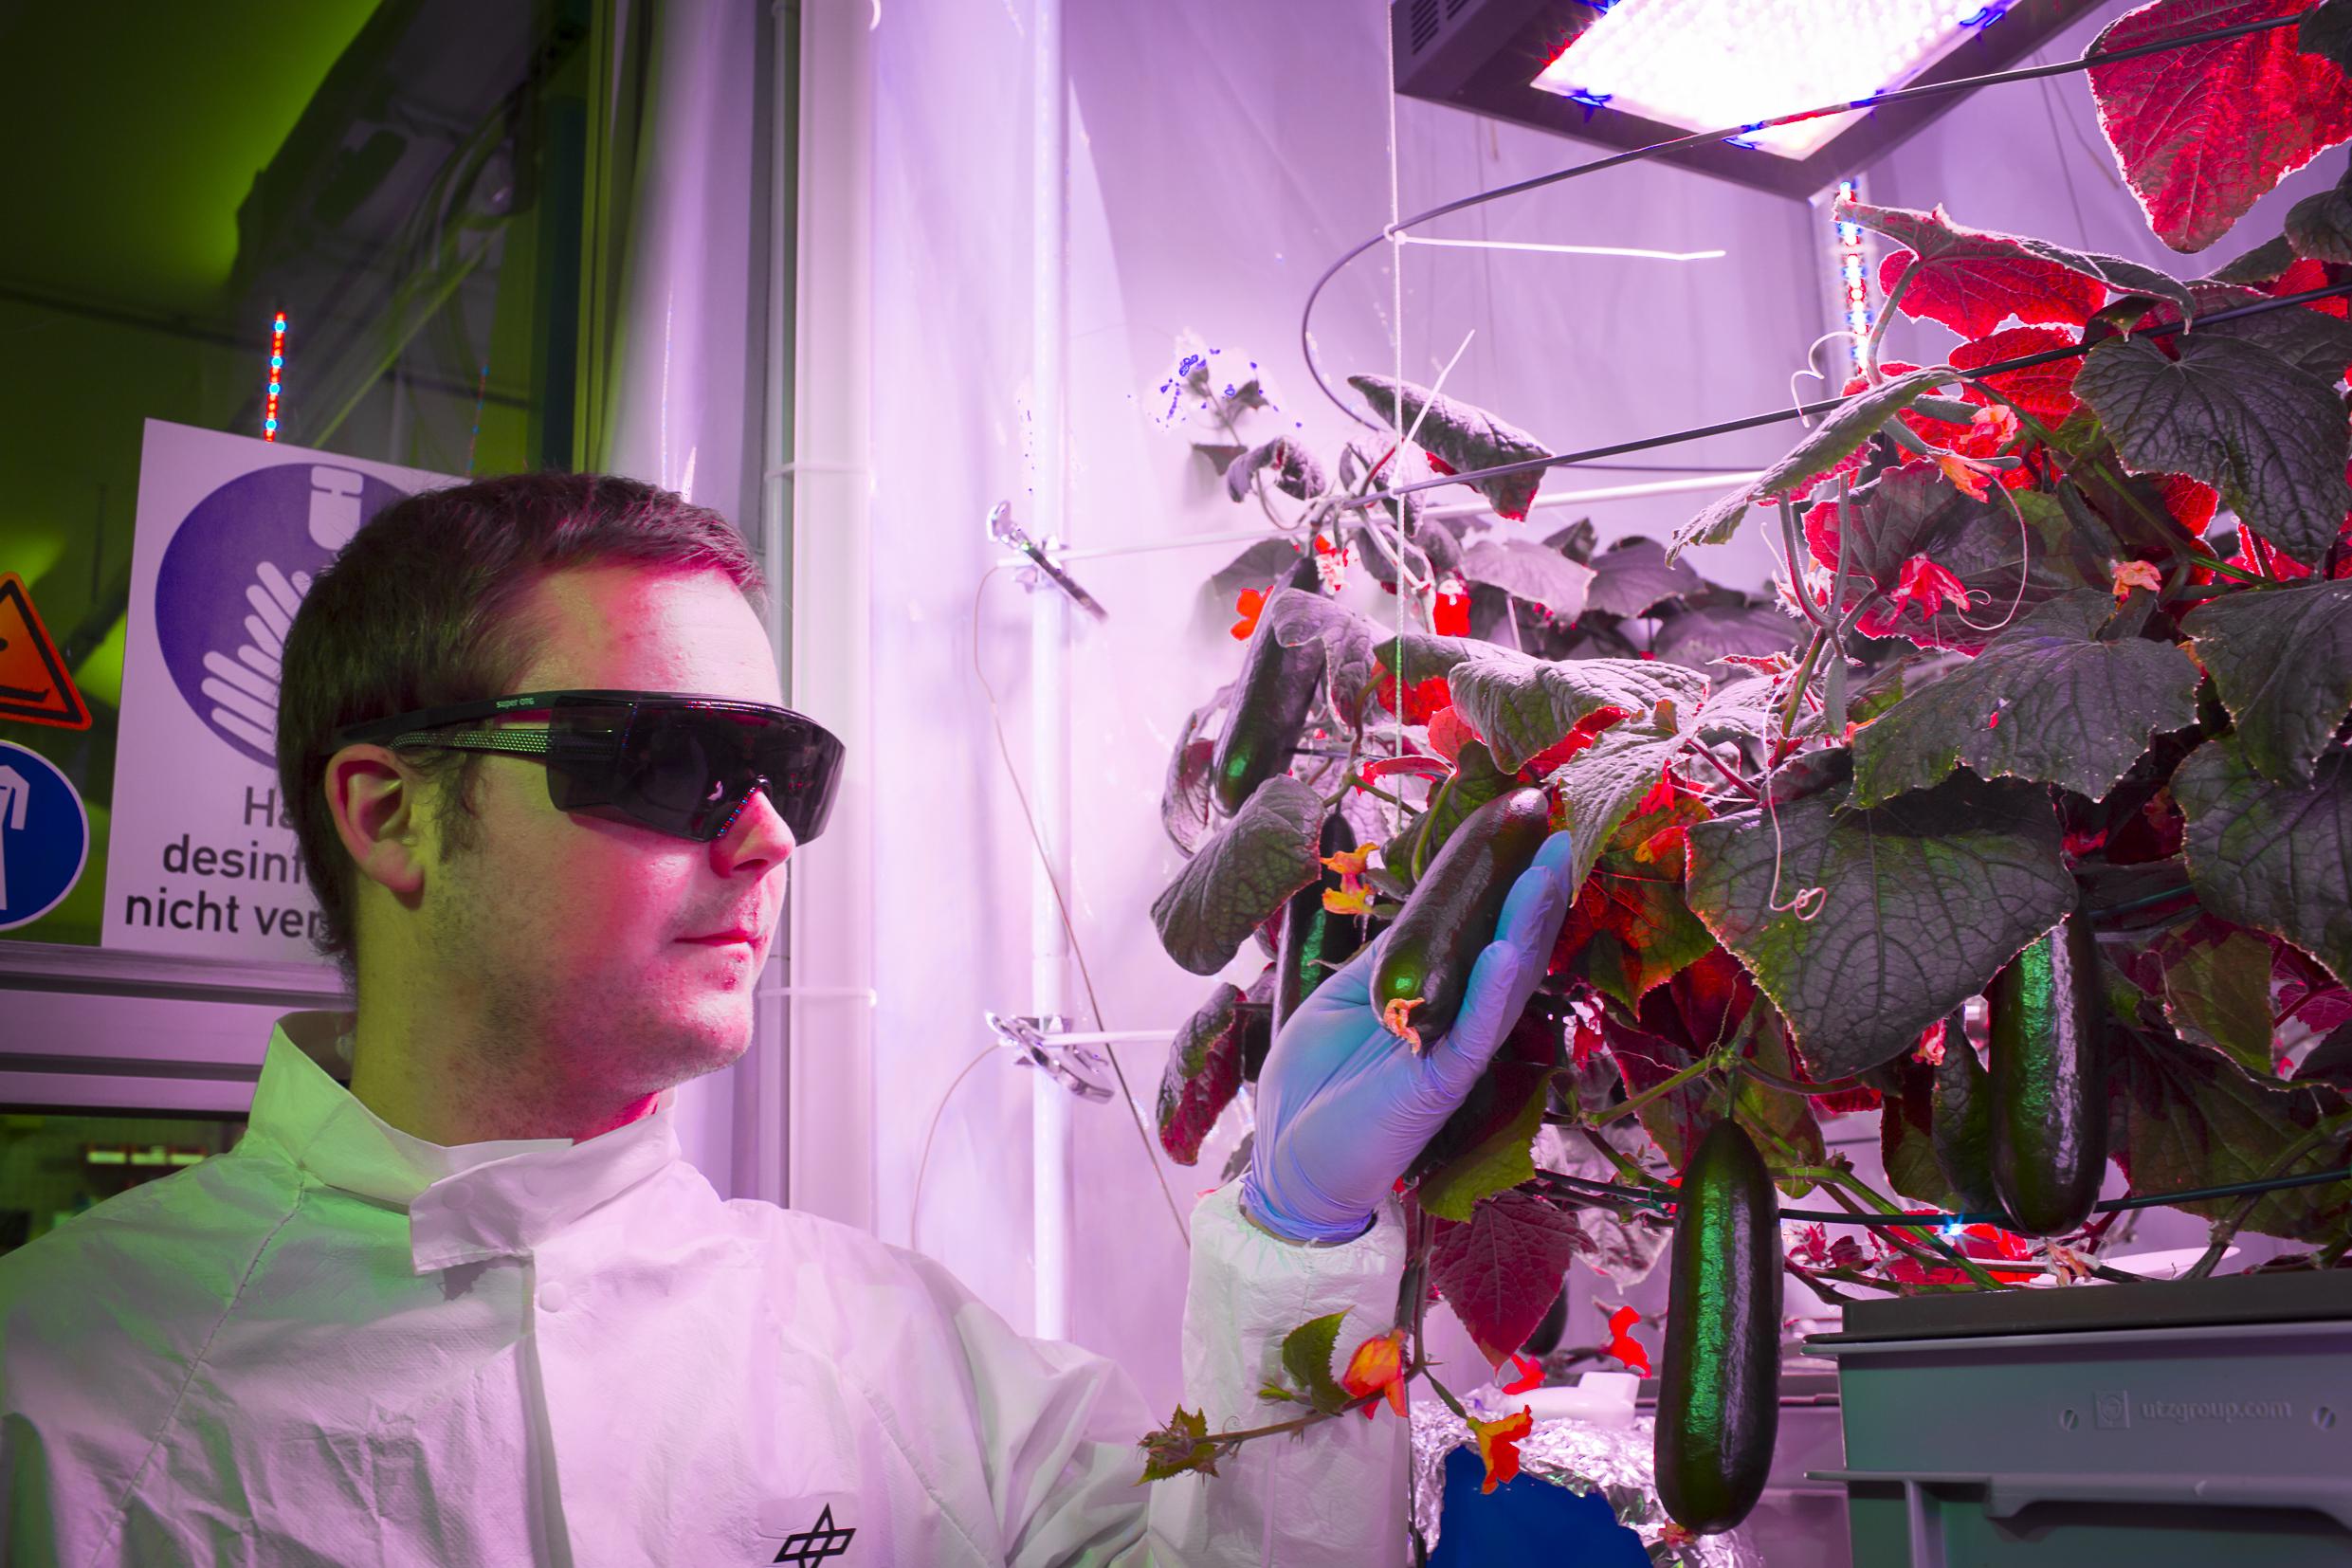 Paul inspecting cucumbers